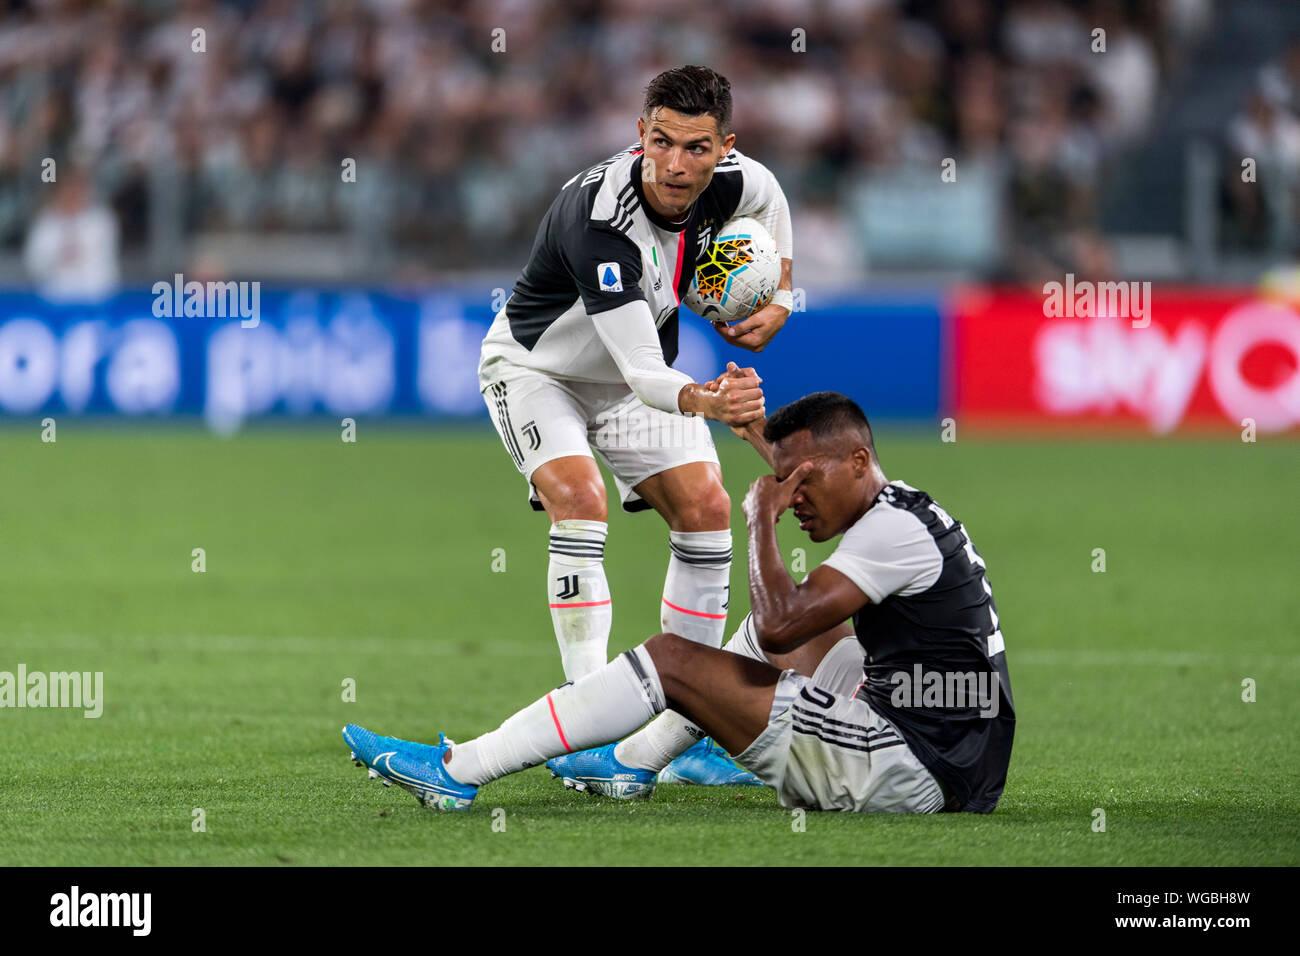 Cristiano Ronaldo dos Santos Aveiro (Juventus) Alex Sandro Lobo Silva  (Juventus) during the Italian